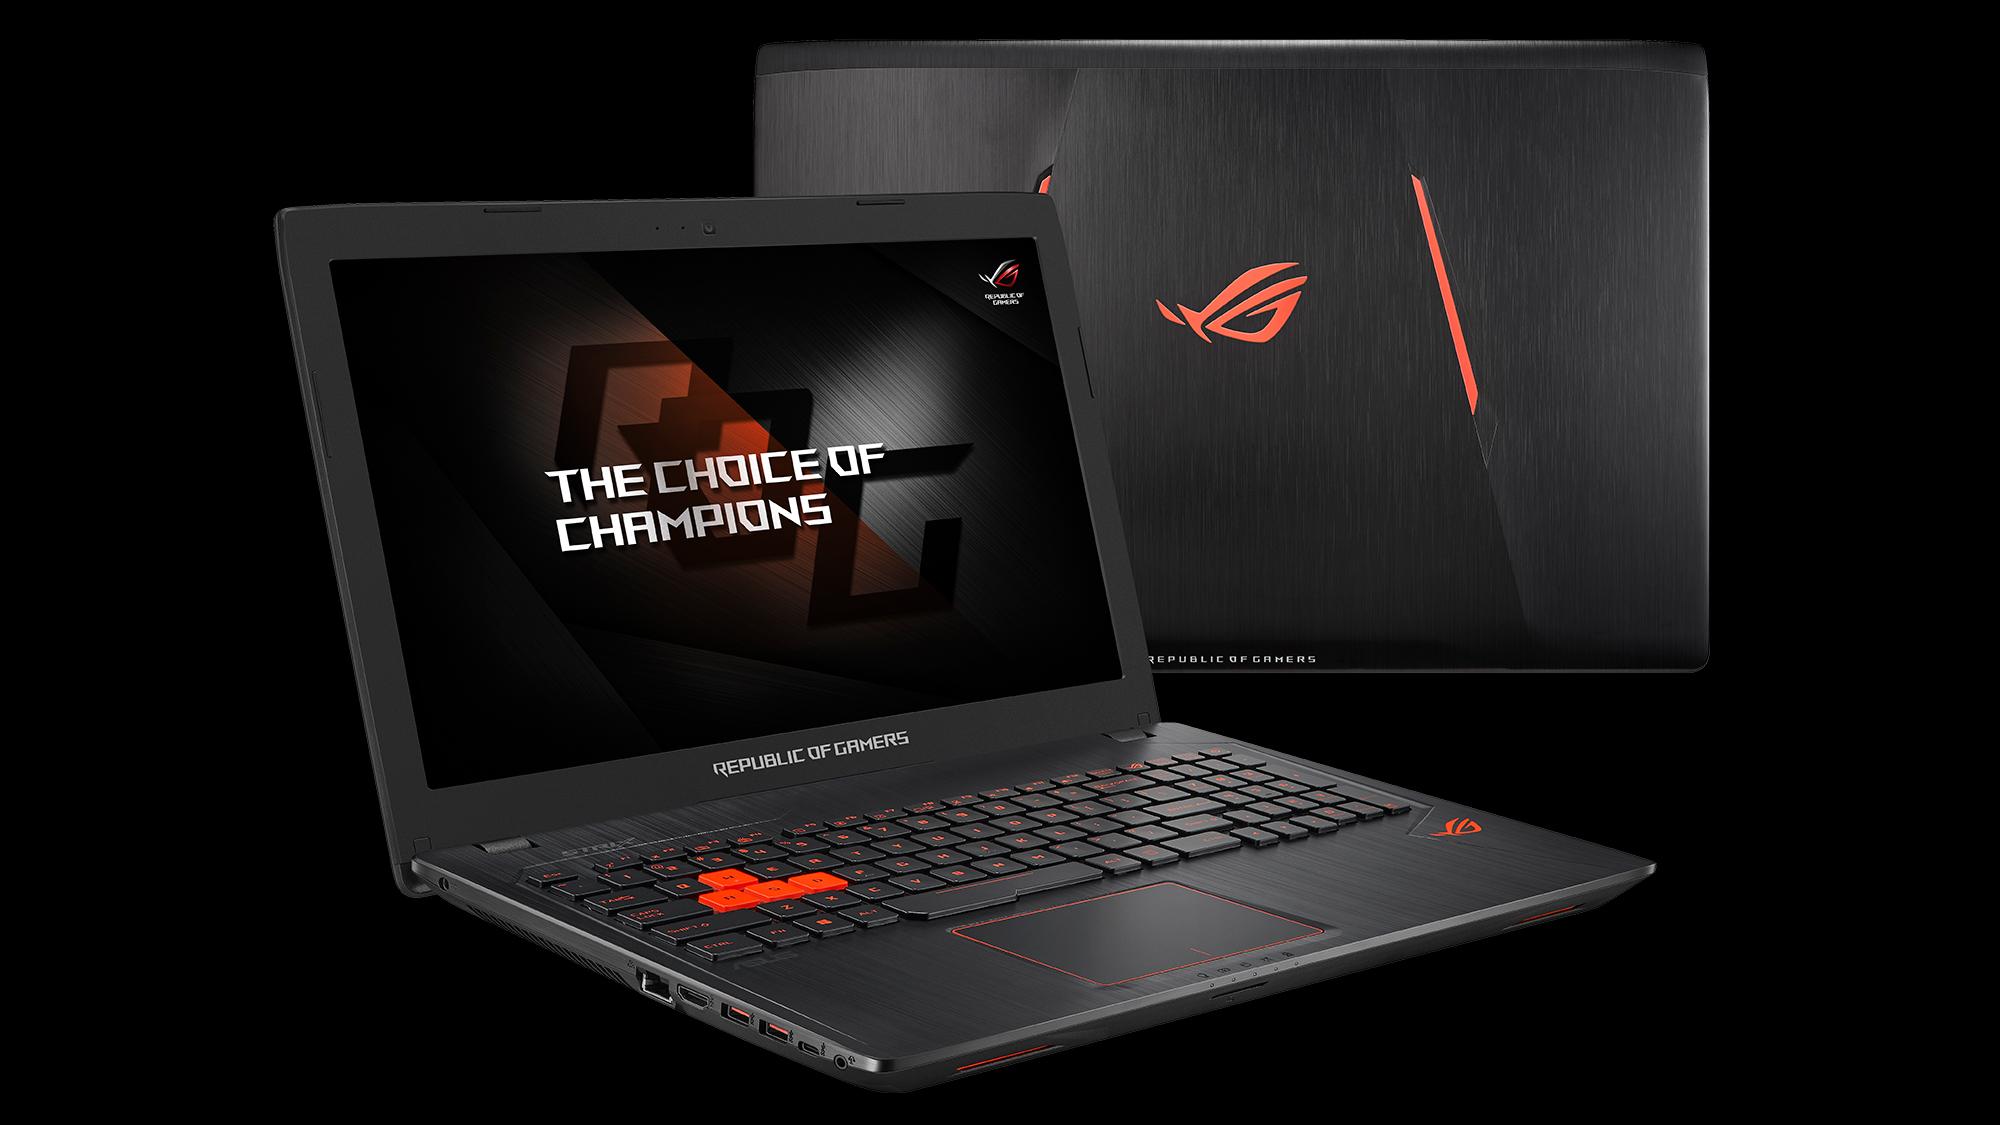 republic of gamers announces strix gl553vw gaming laptop